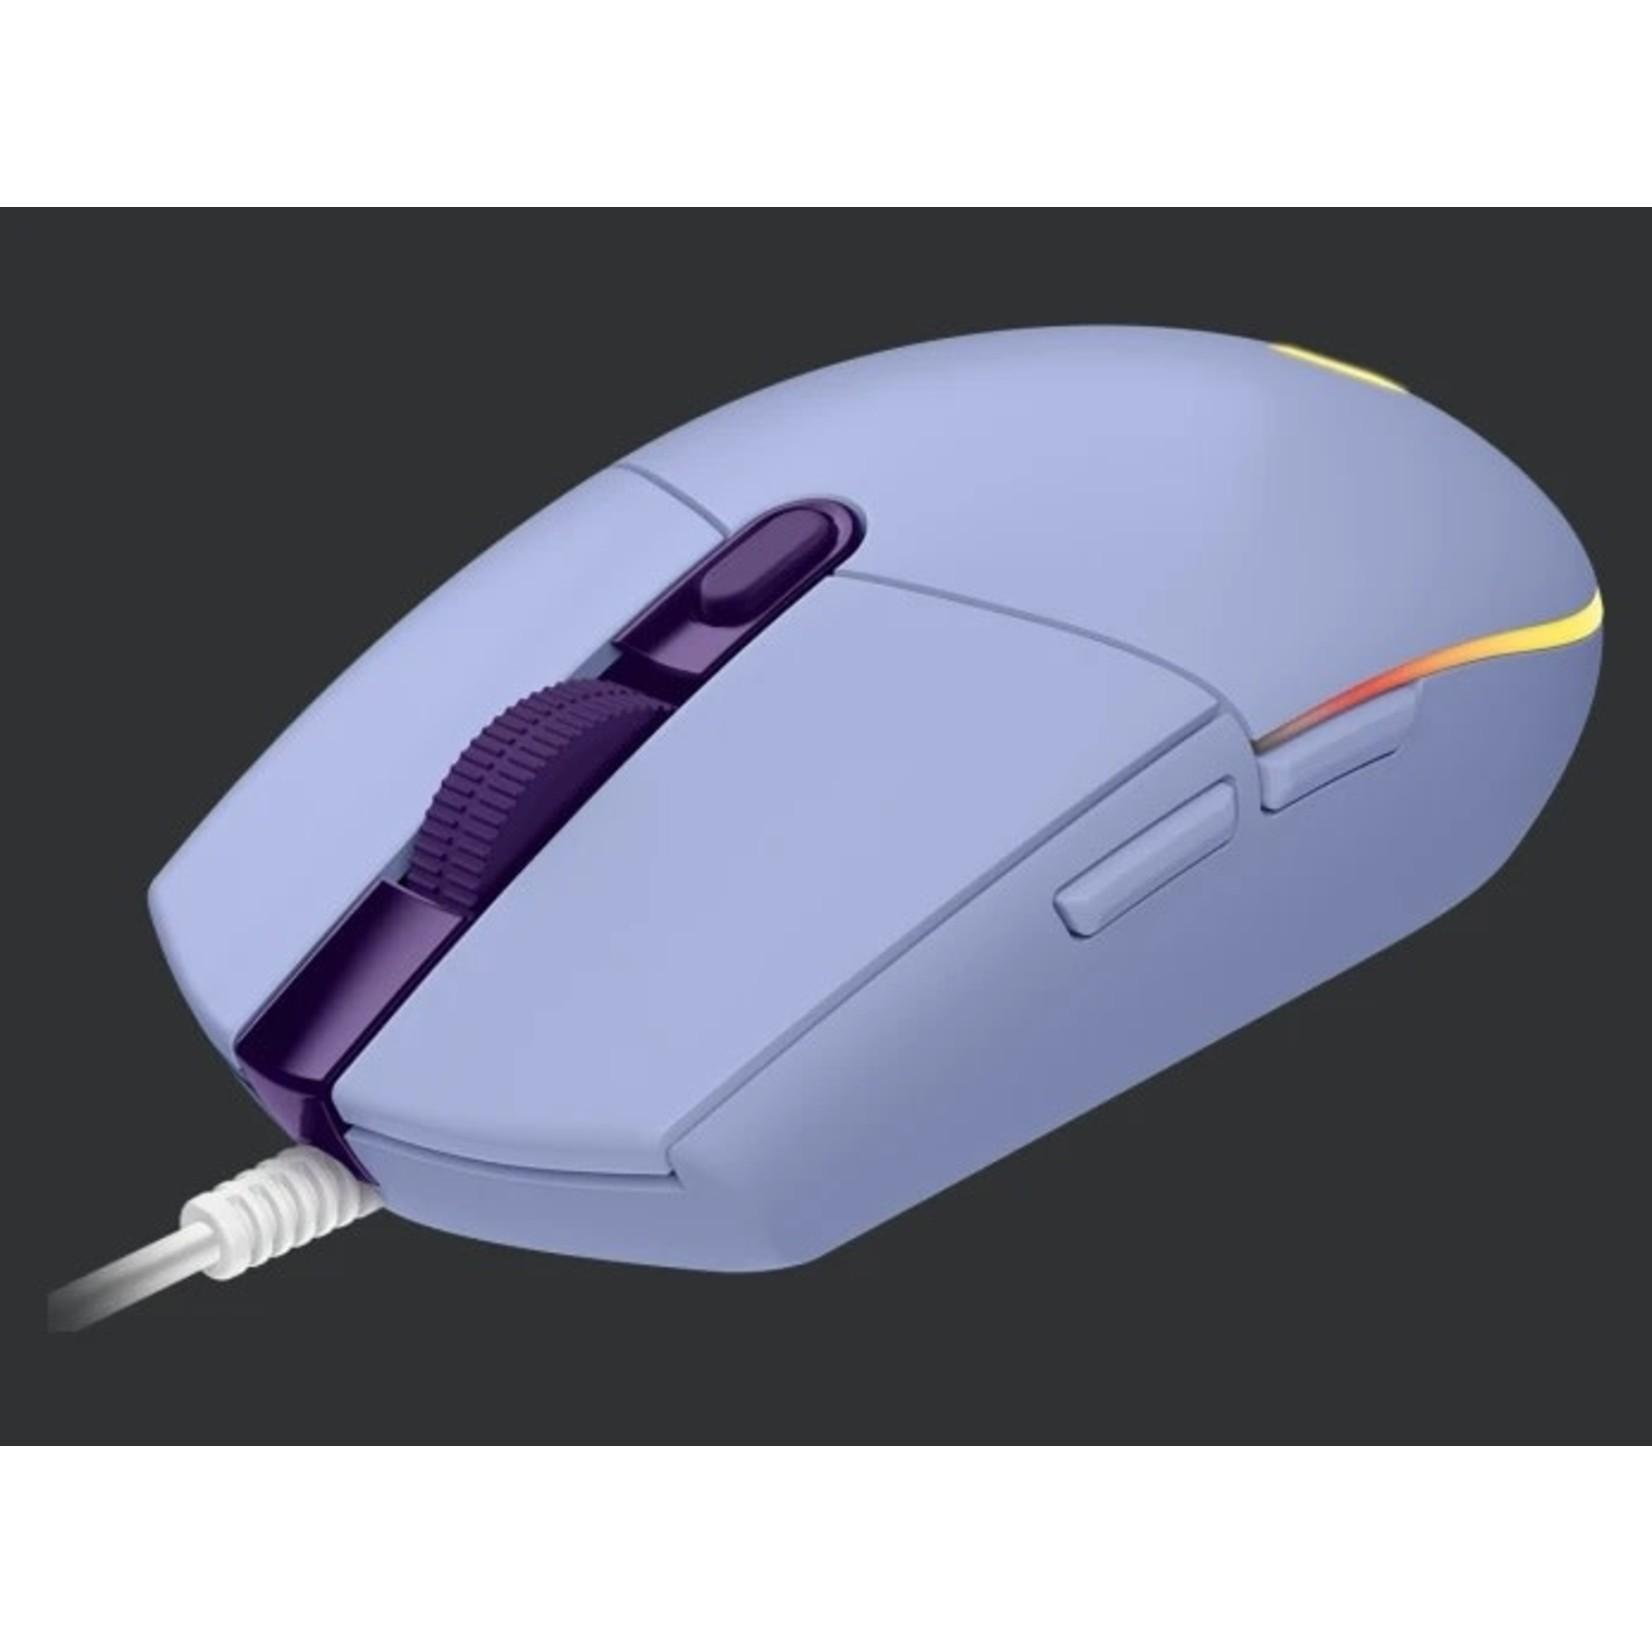 Logitech Logitech G203 Lightsync Gaming Mouse Lilac